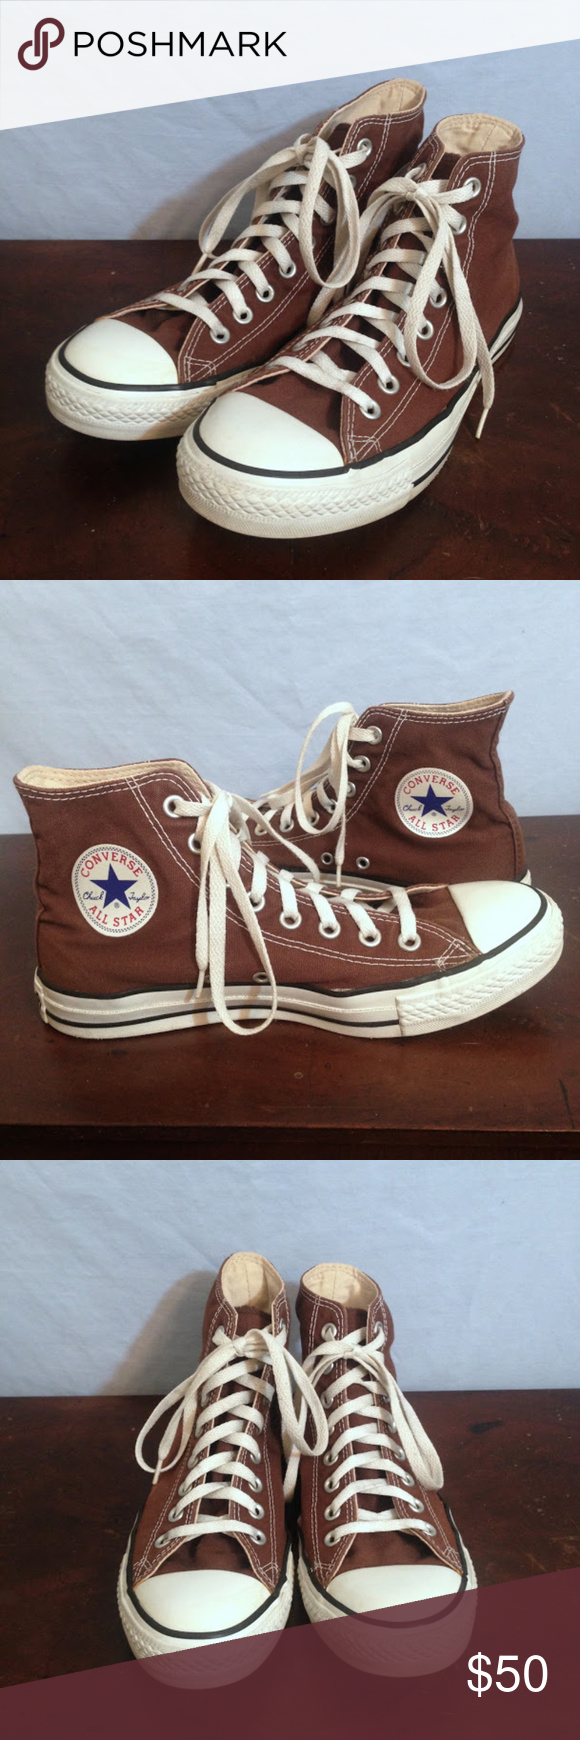 6e26fdbcc43e Saddle Brown Converse All-Star High-Top Sneakers Saddle Brown Converse  Canvas All-